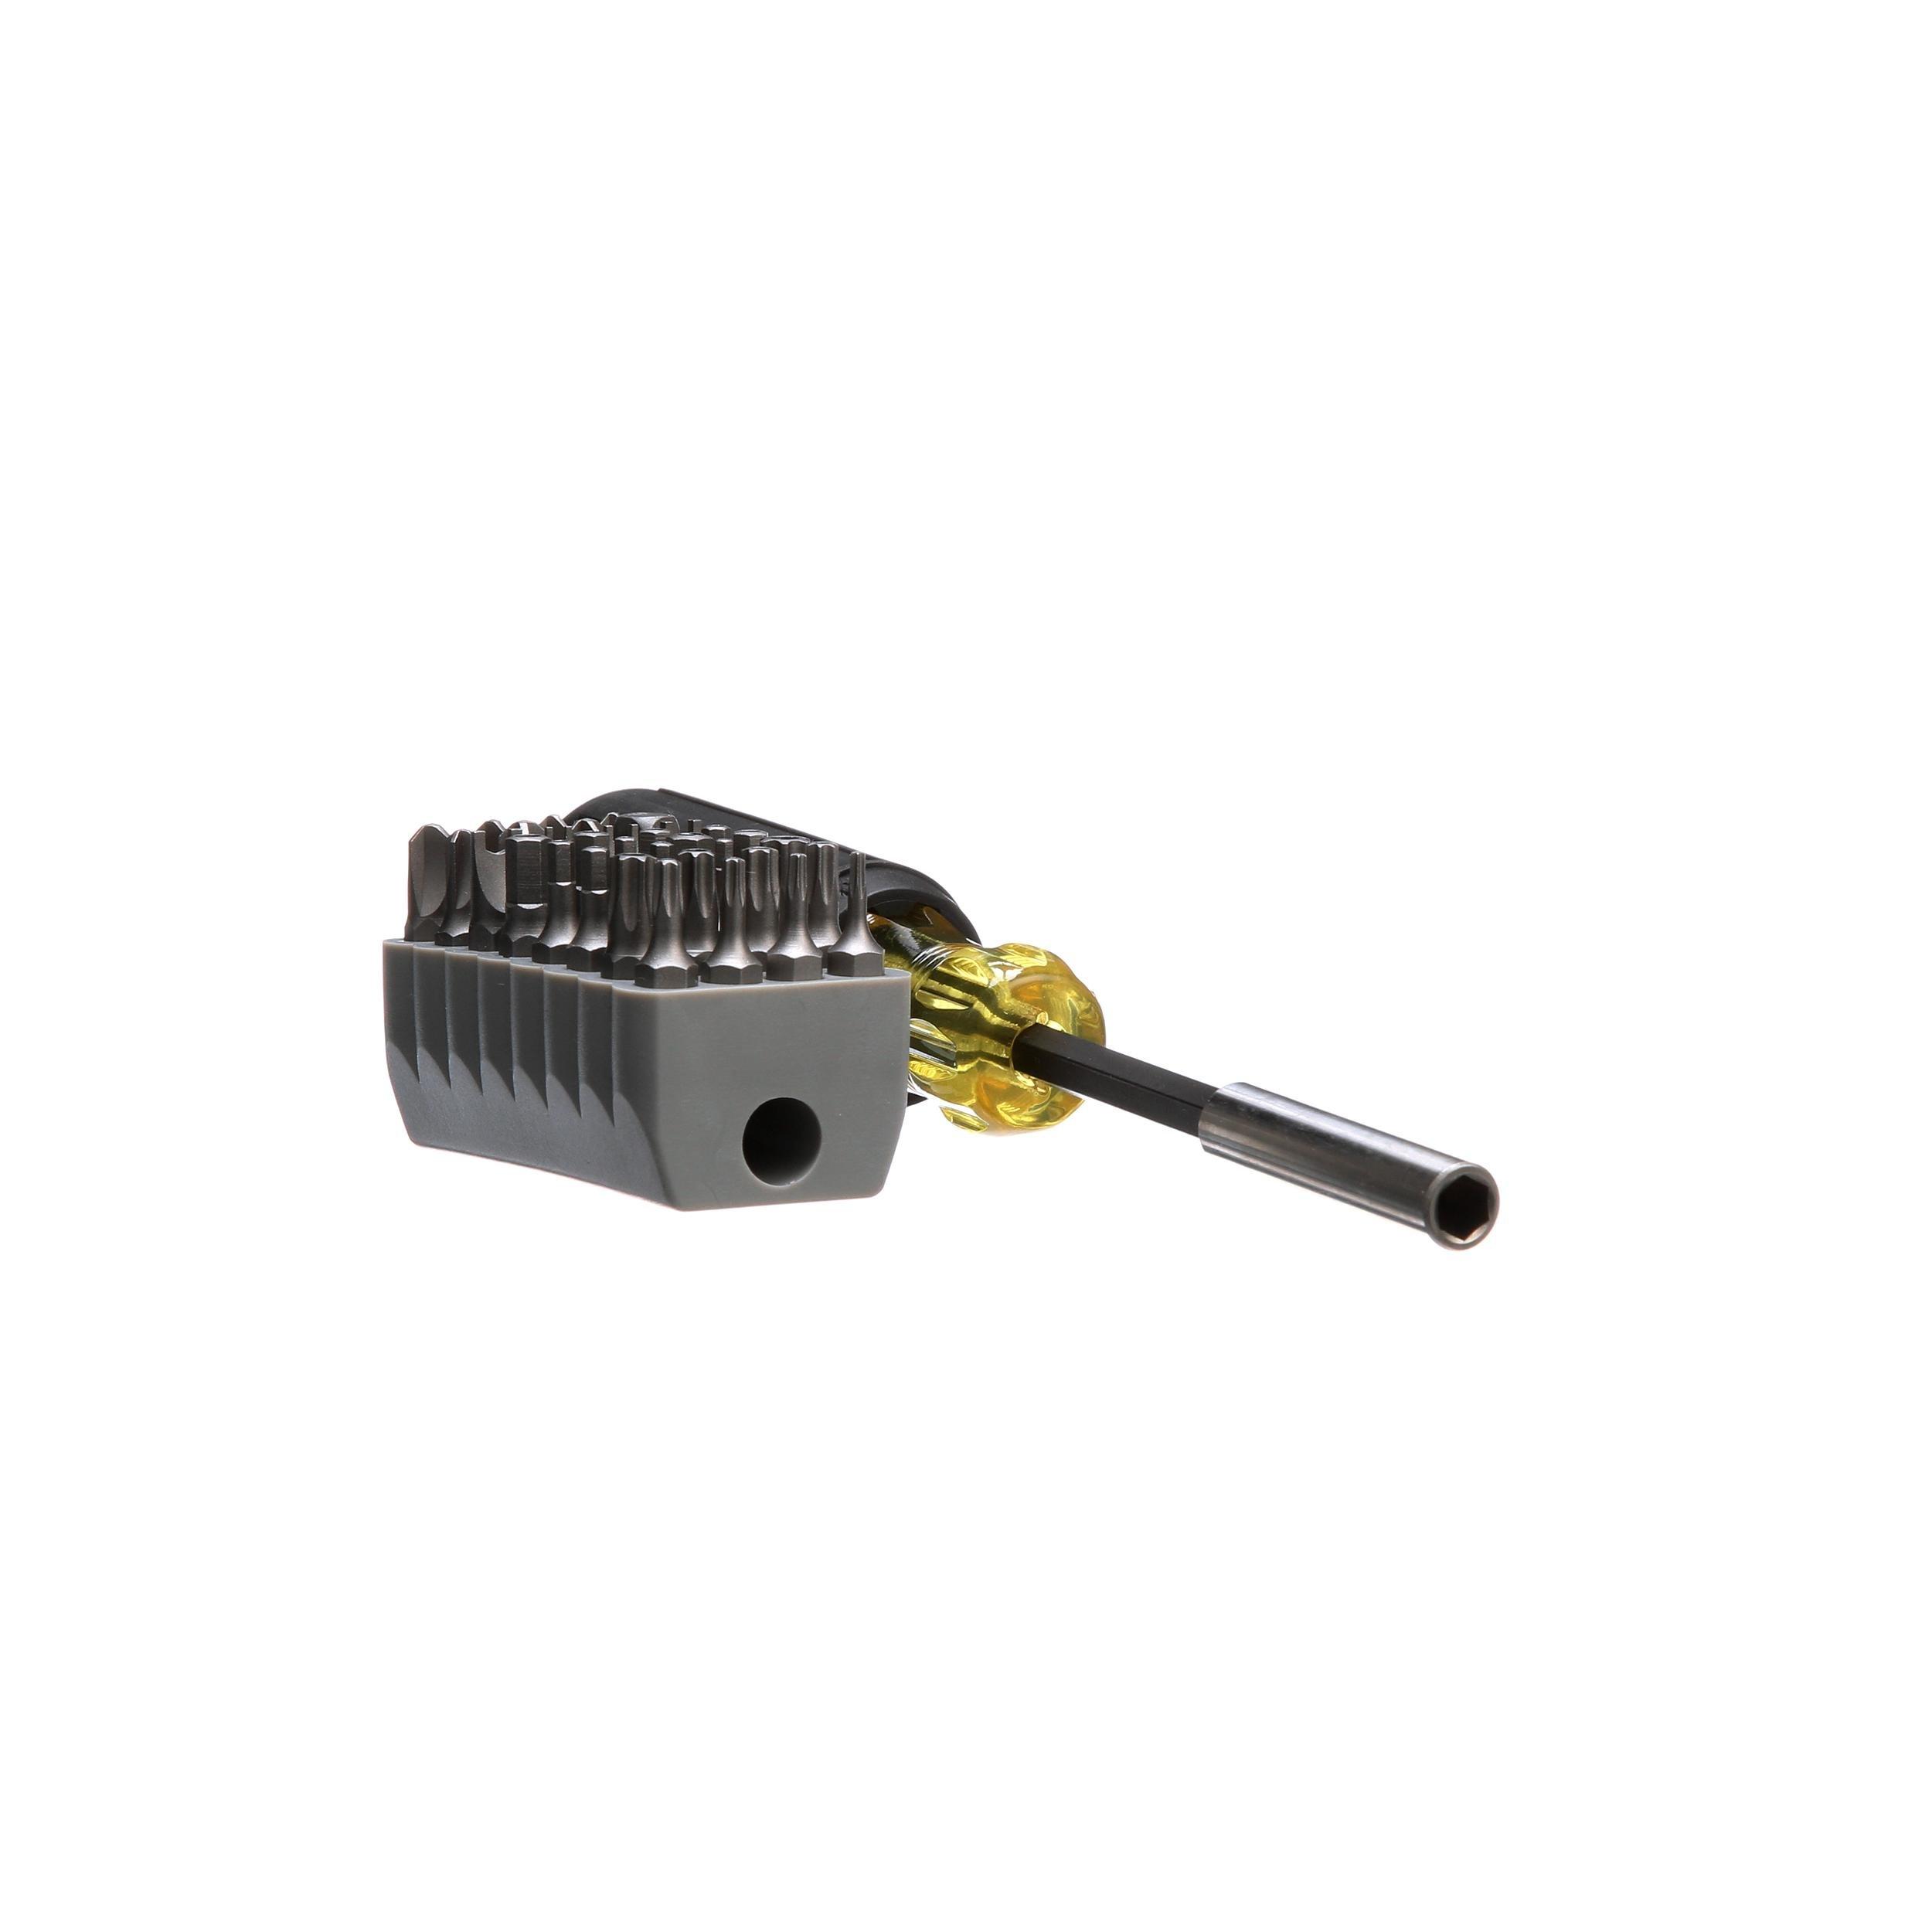 Screwdriver Includes Magnetic Tamperproof TORX, Hex, Spanner, TORQ, Triwing Bits, 32 Piece Klein Tools 32510